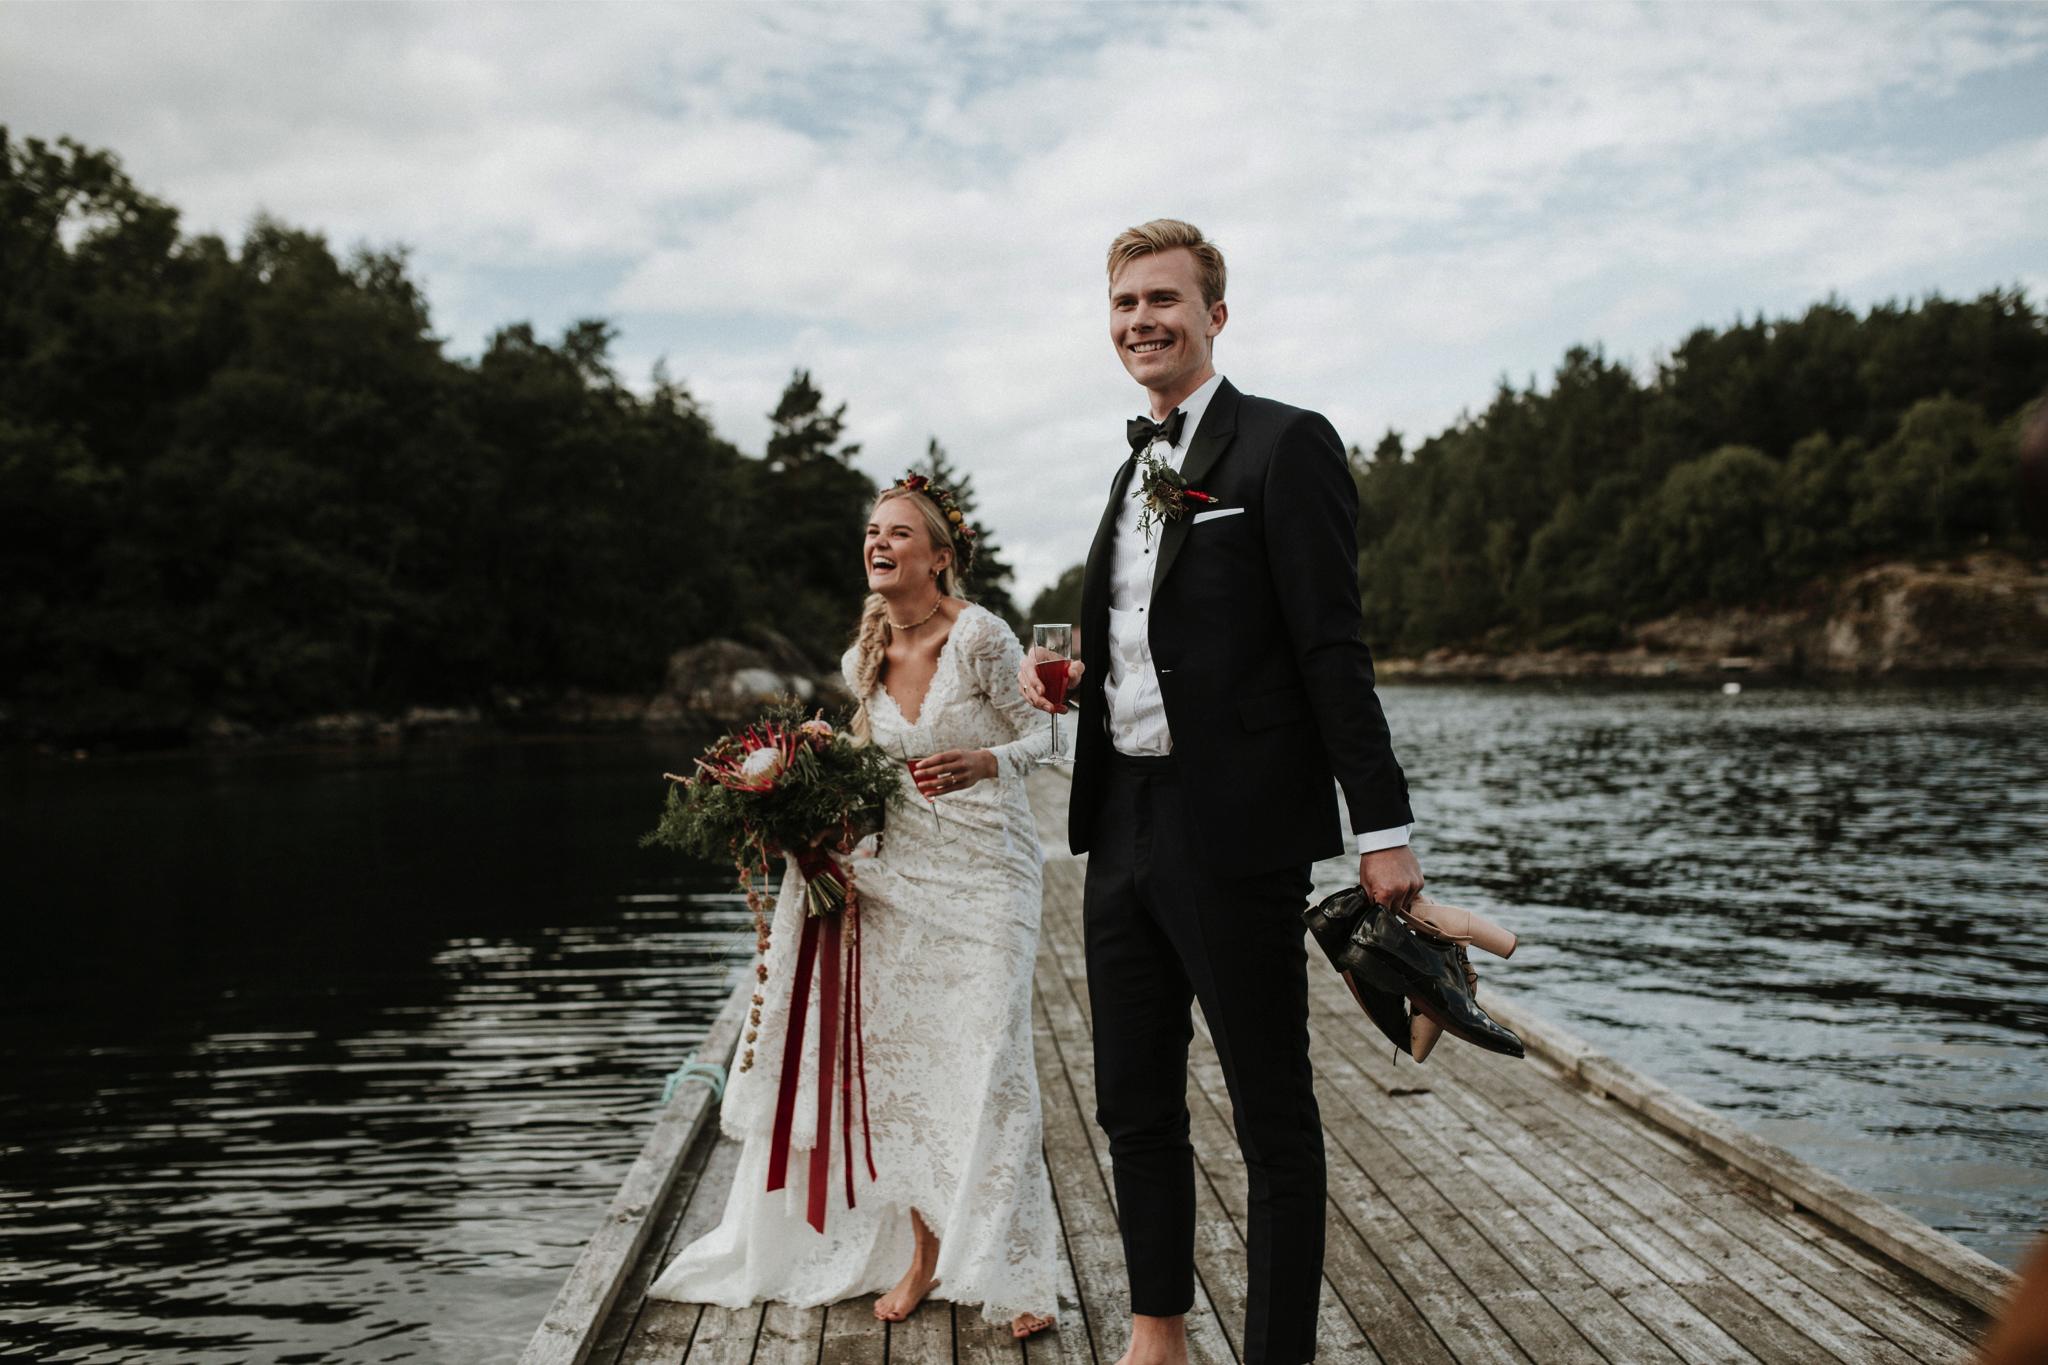 Norway-wedding-photographer-adventure-session_4.jpg